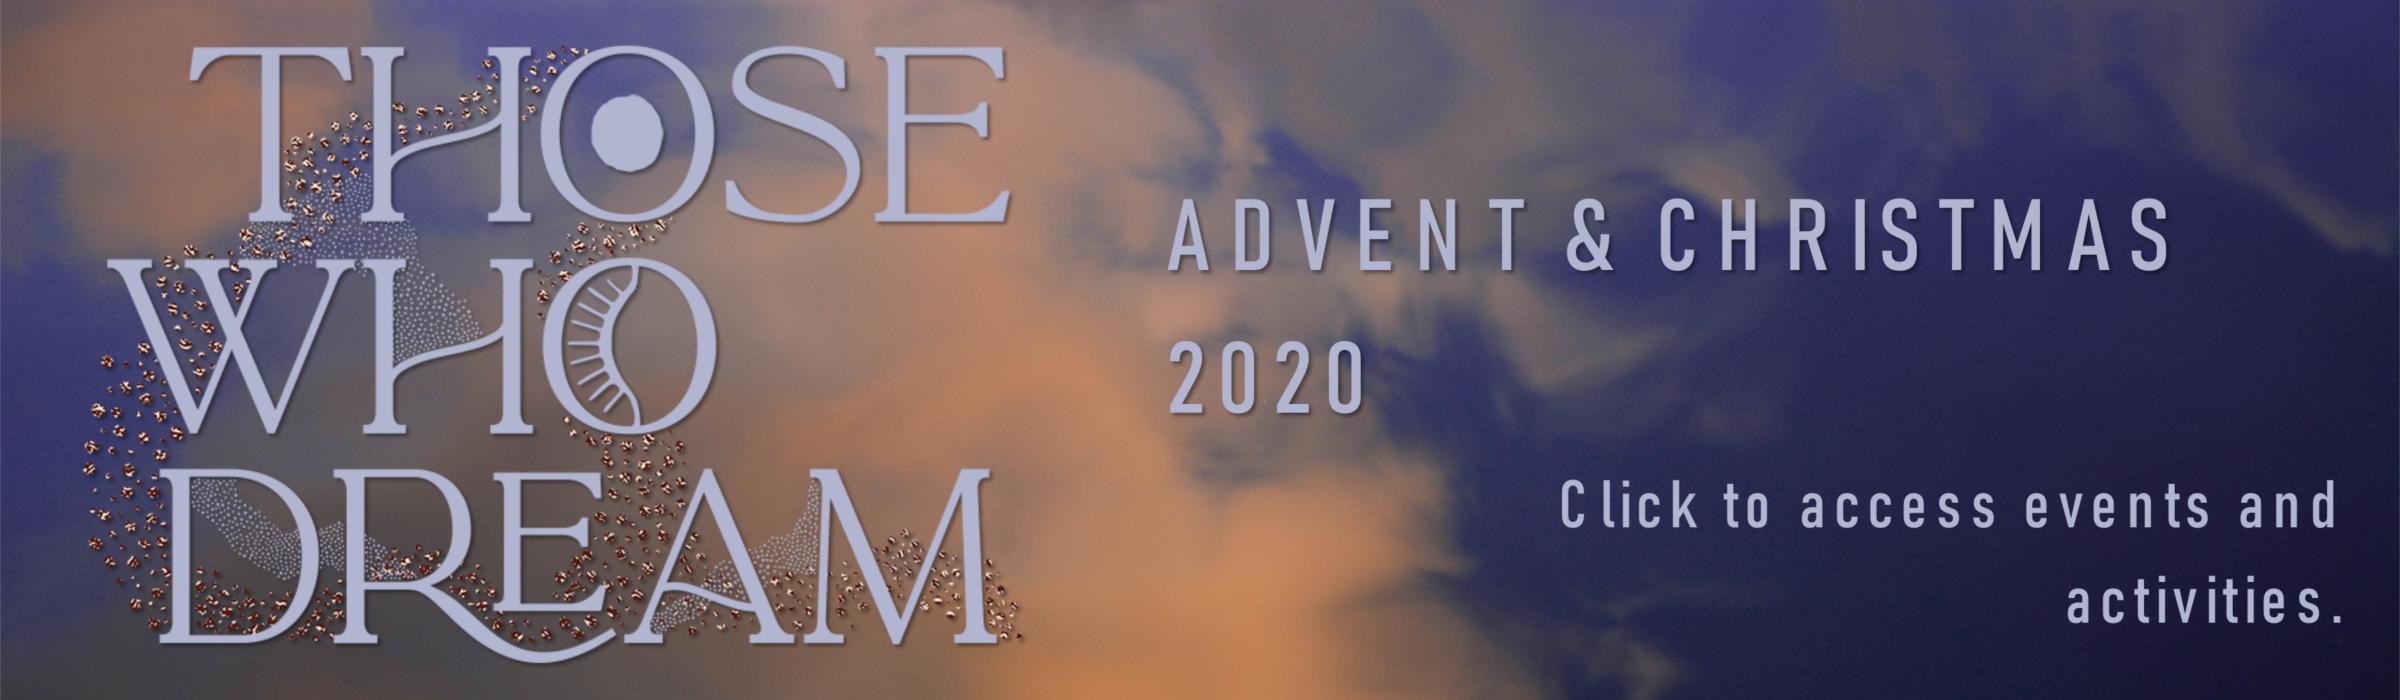 AdventBanner2020